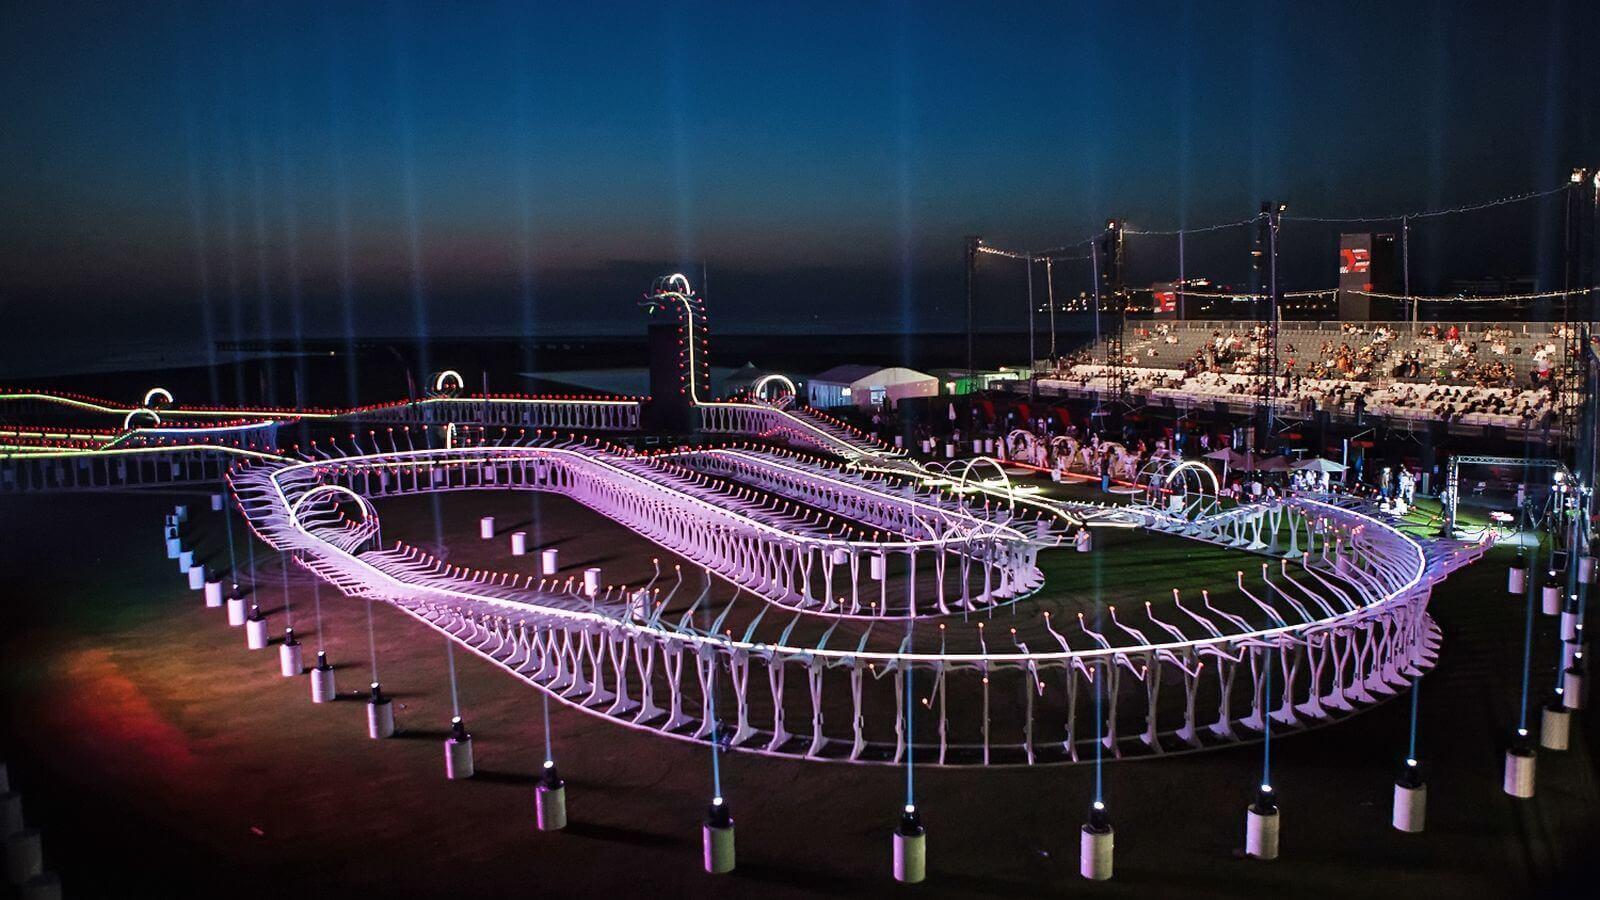 Many race courses use LED lights.